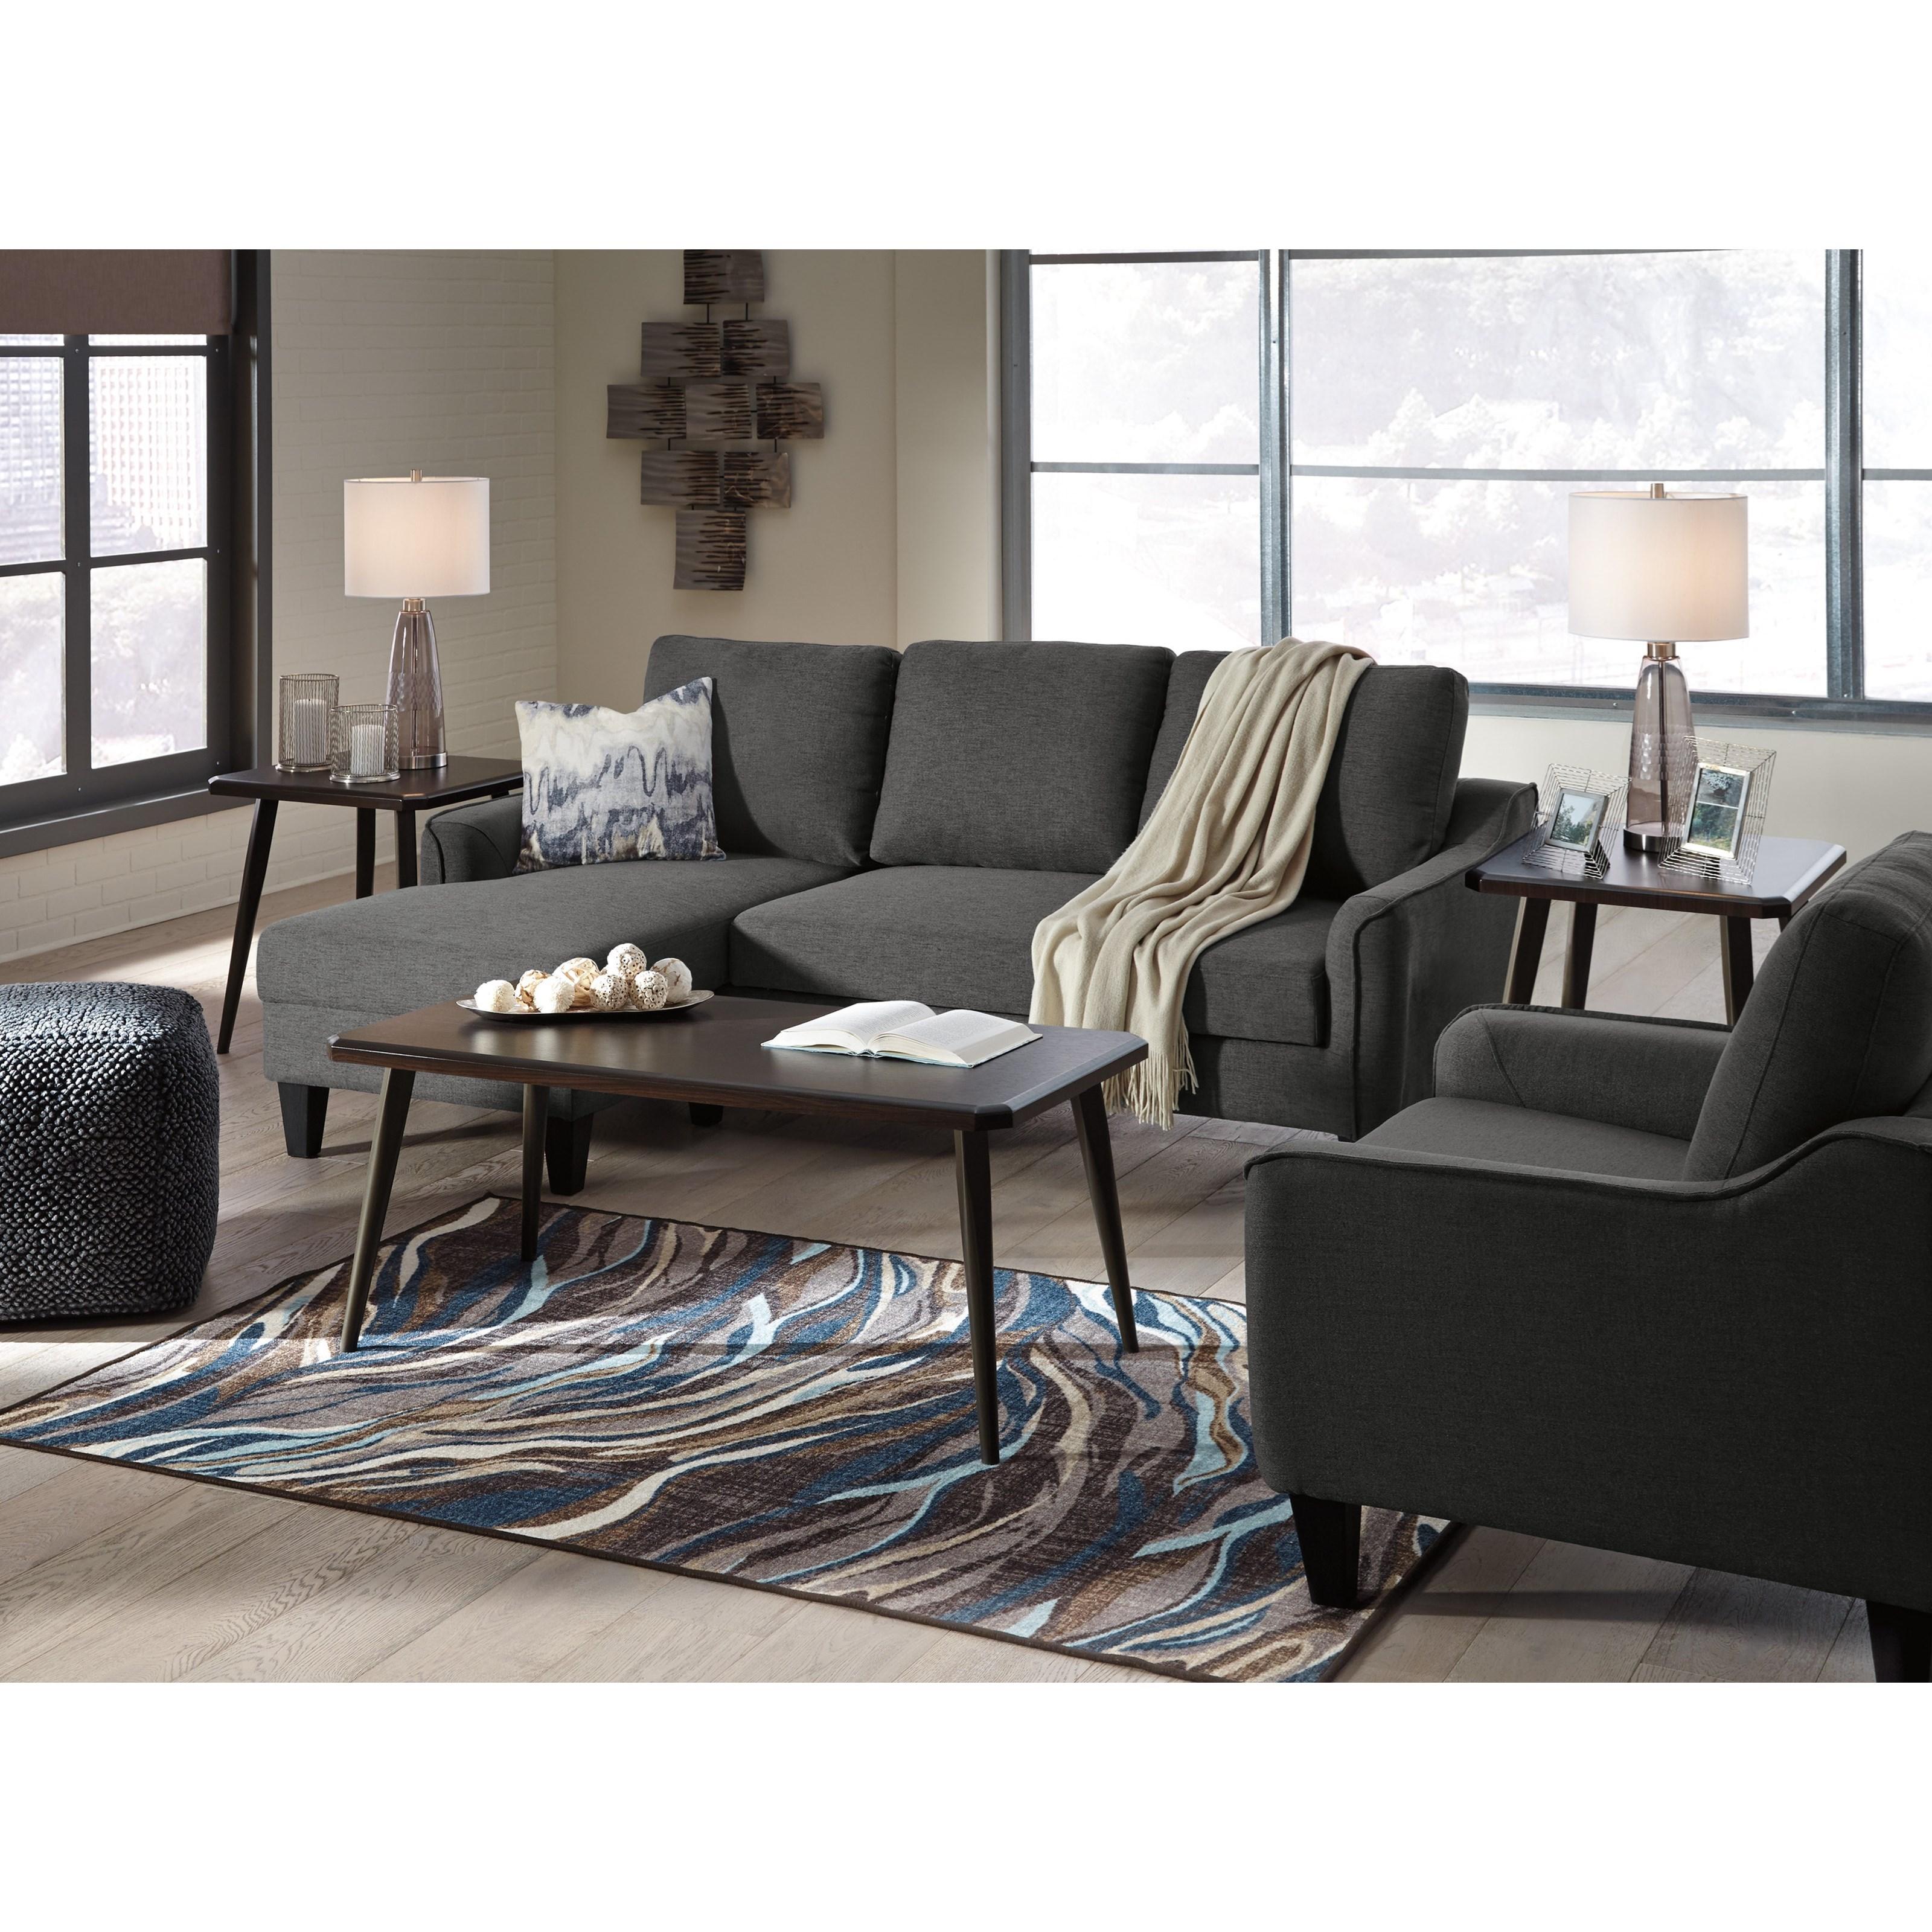 Jarreau Living Room Group by Signature Design by Ashley at HomeWorld Furniture